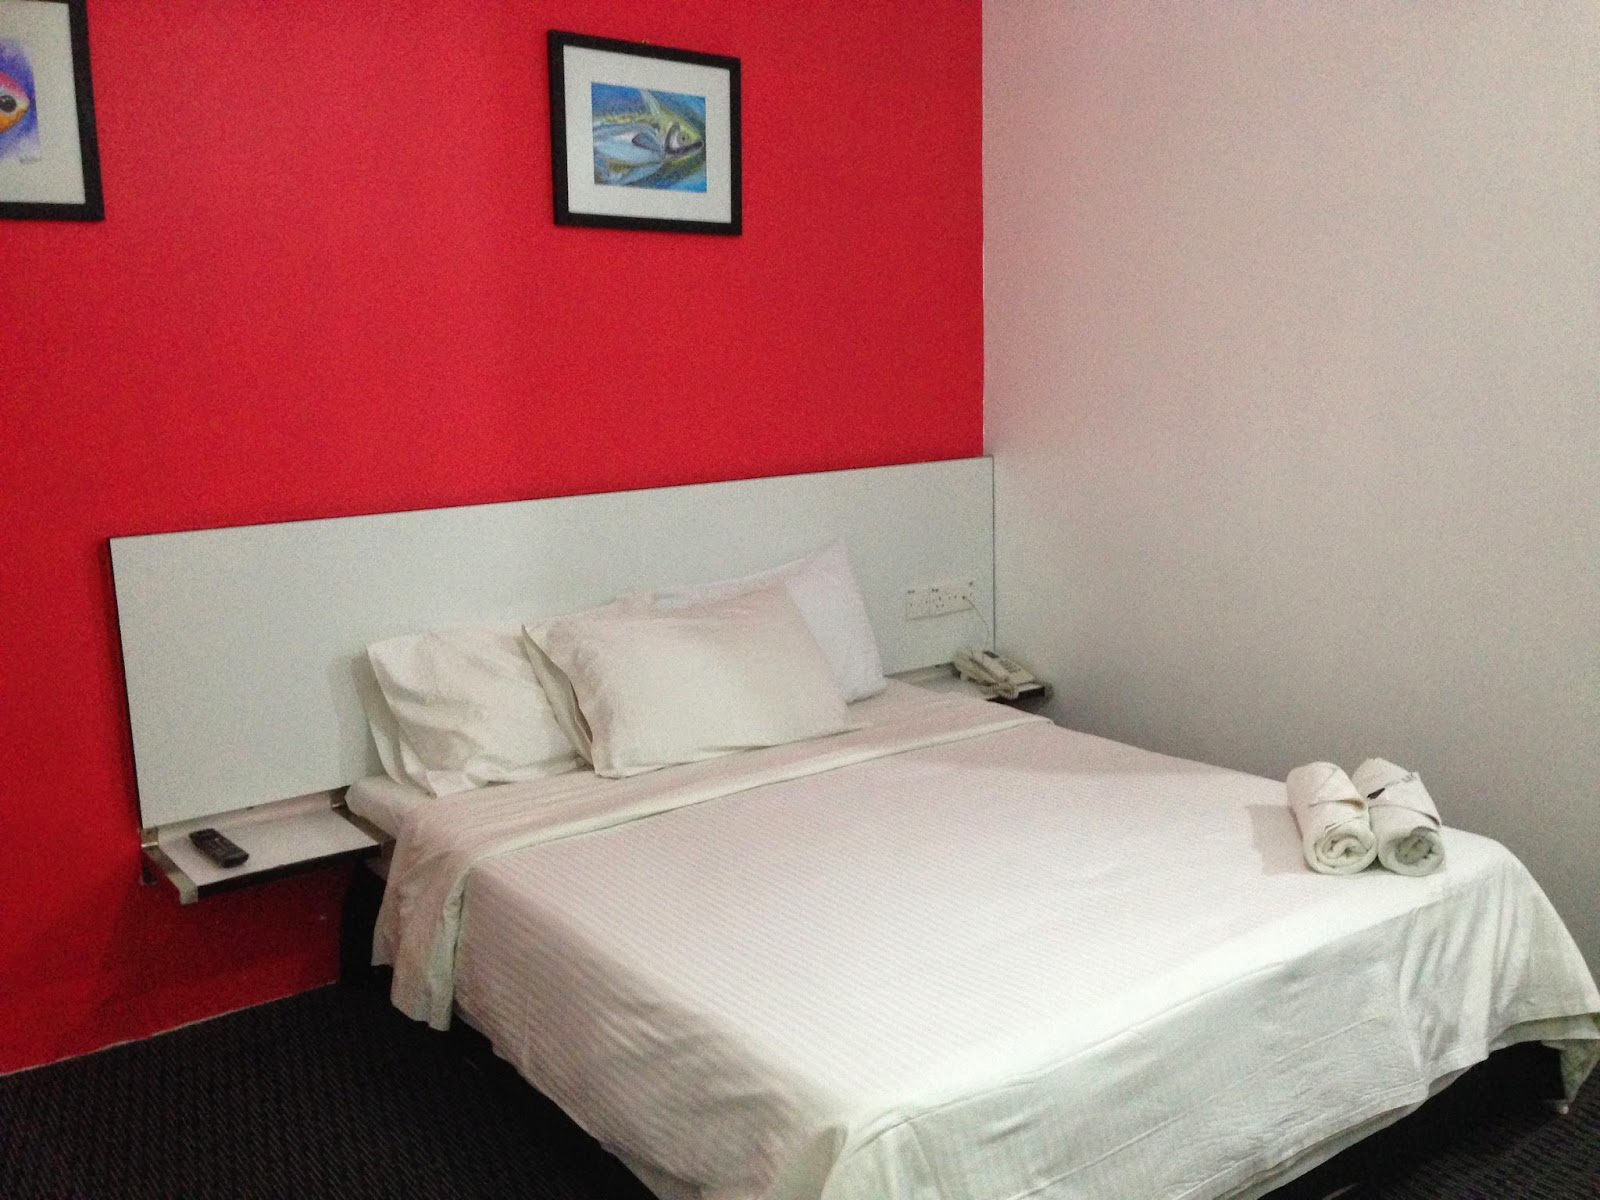 Ridel Hotel executive room bed